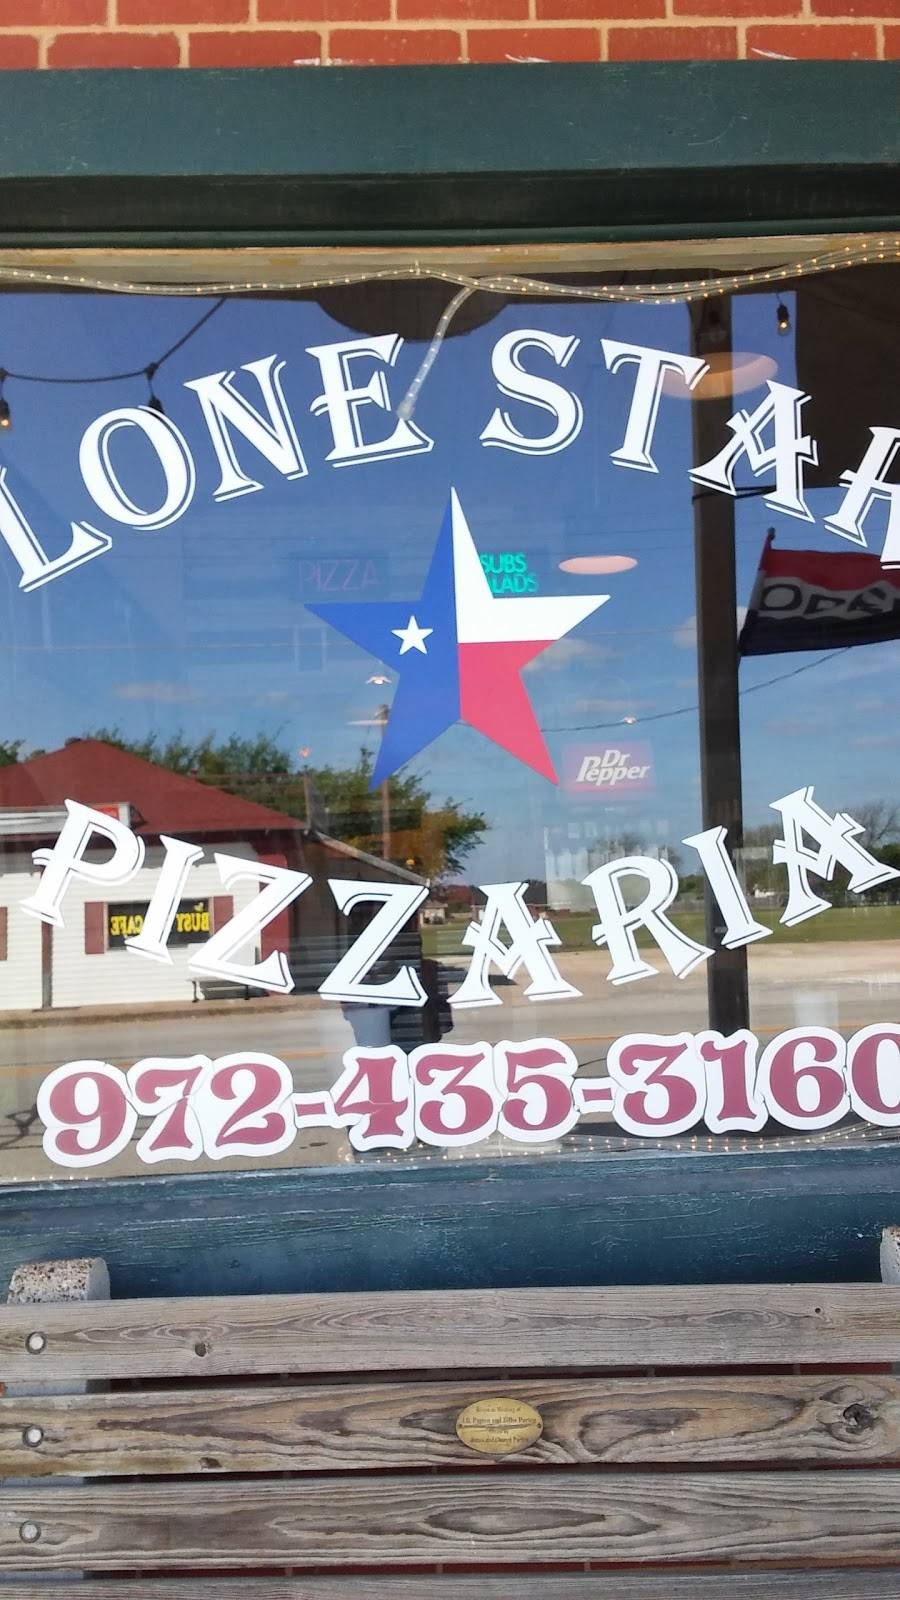 Lone Star Pizzeria Restaurant 302 S Main St Maypearl